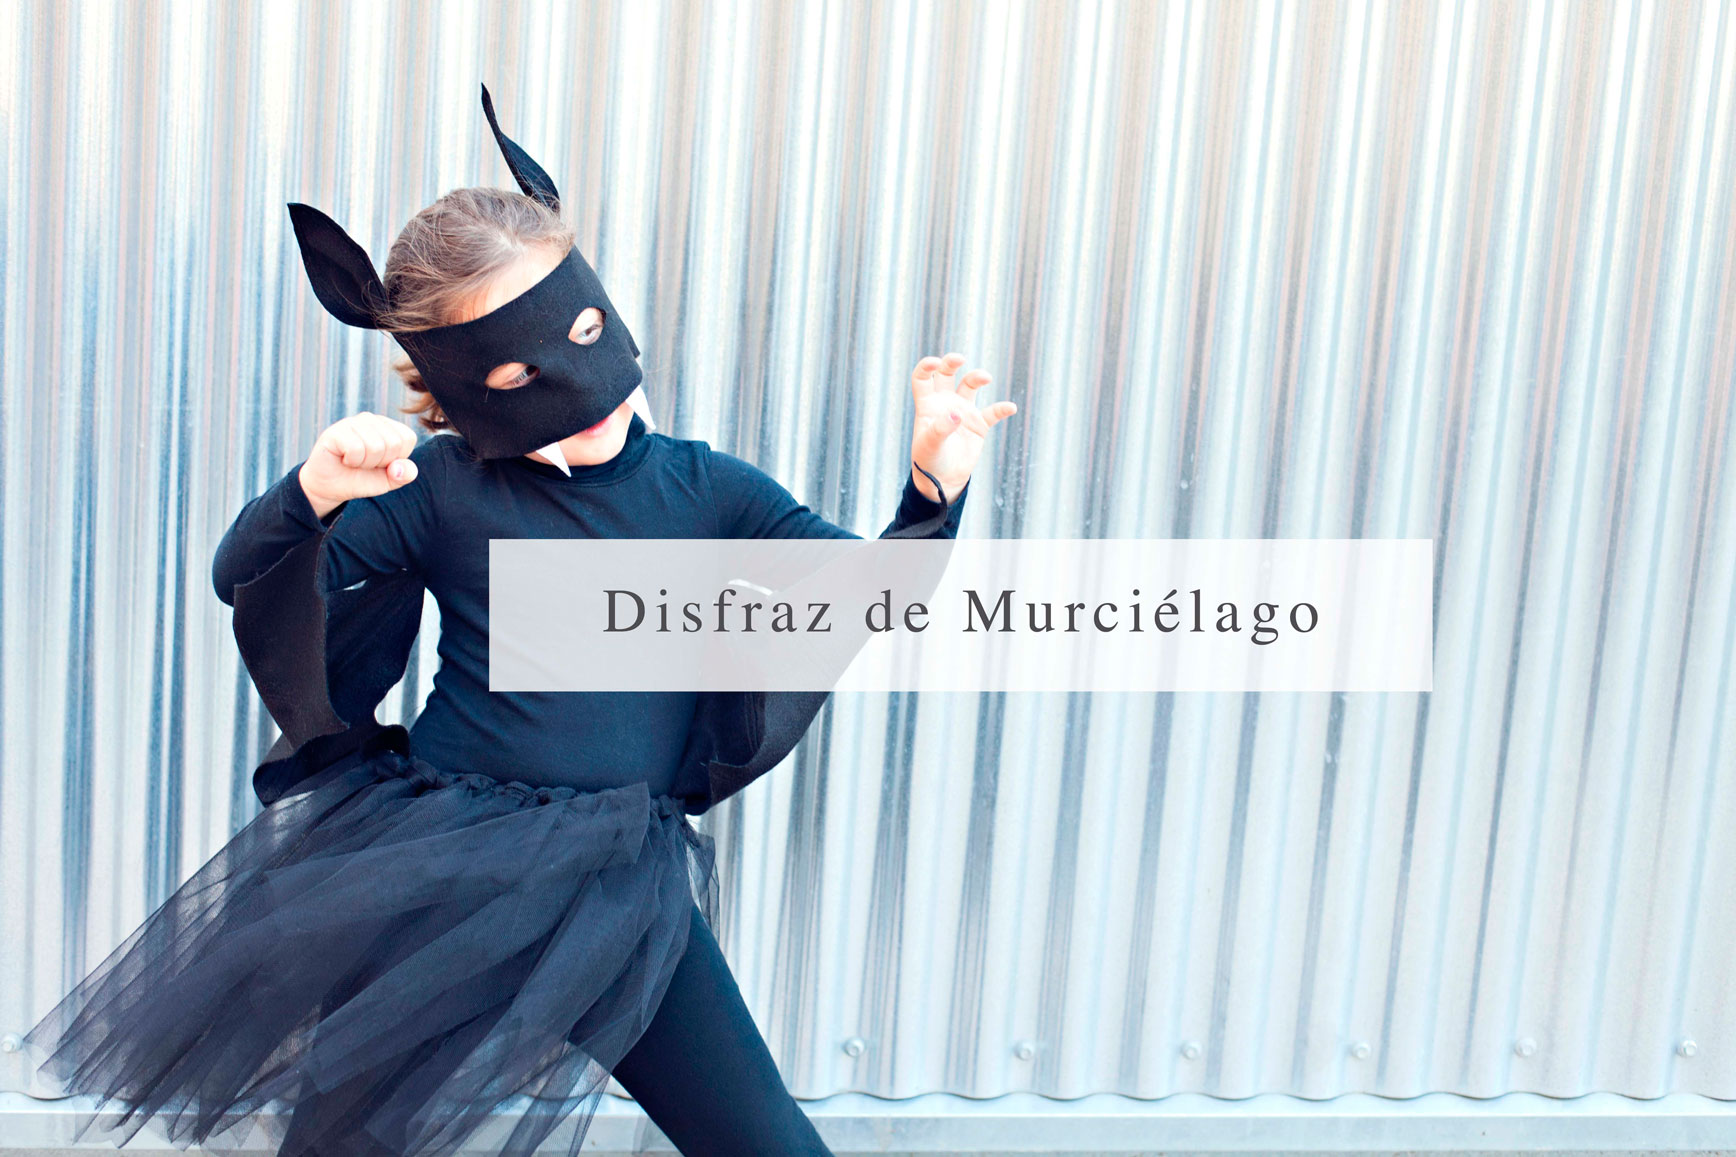 Disfraz Murcielago_claraBmartin06